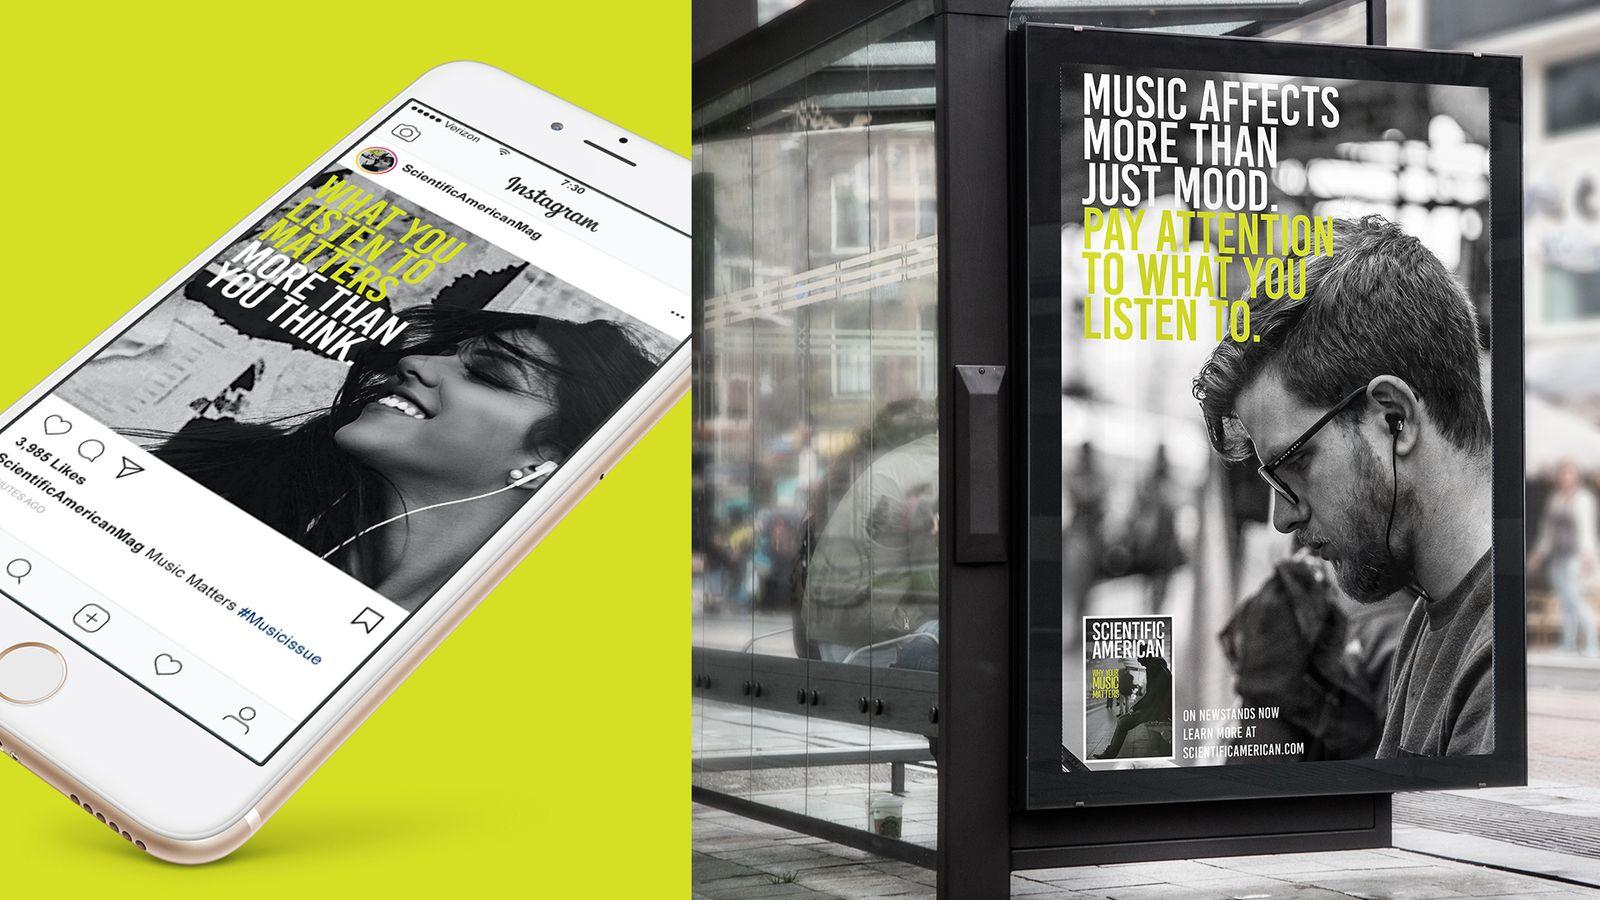 Scientific American social media and outdoor advertising